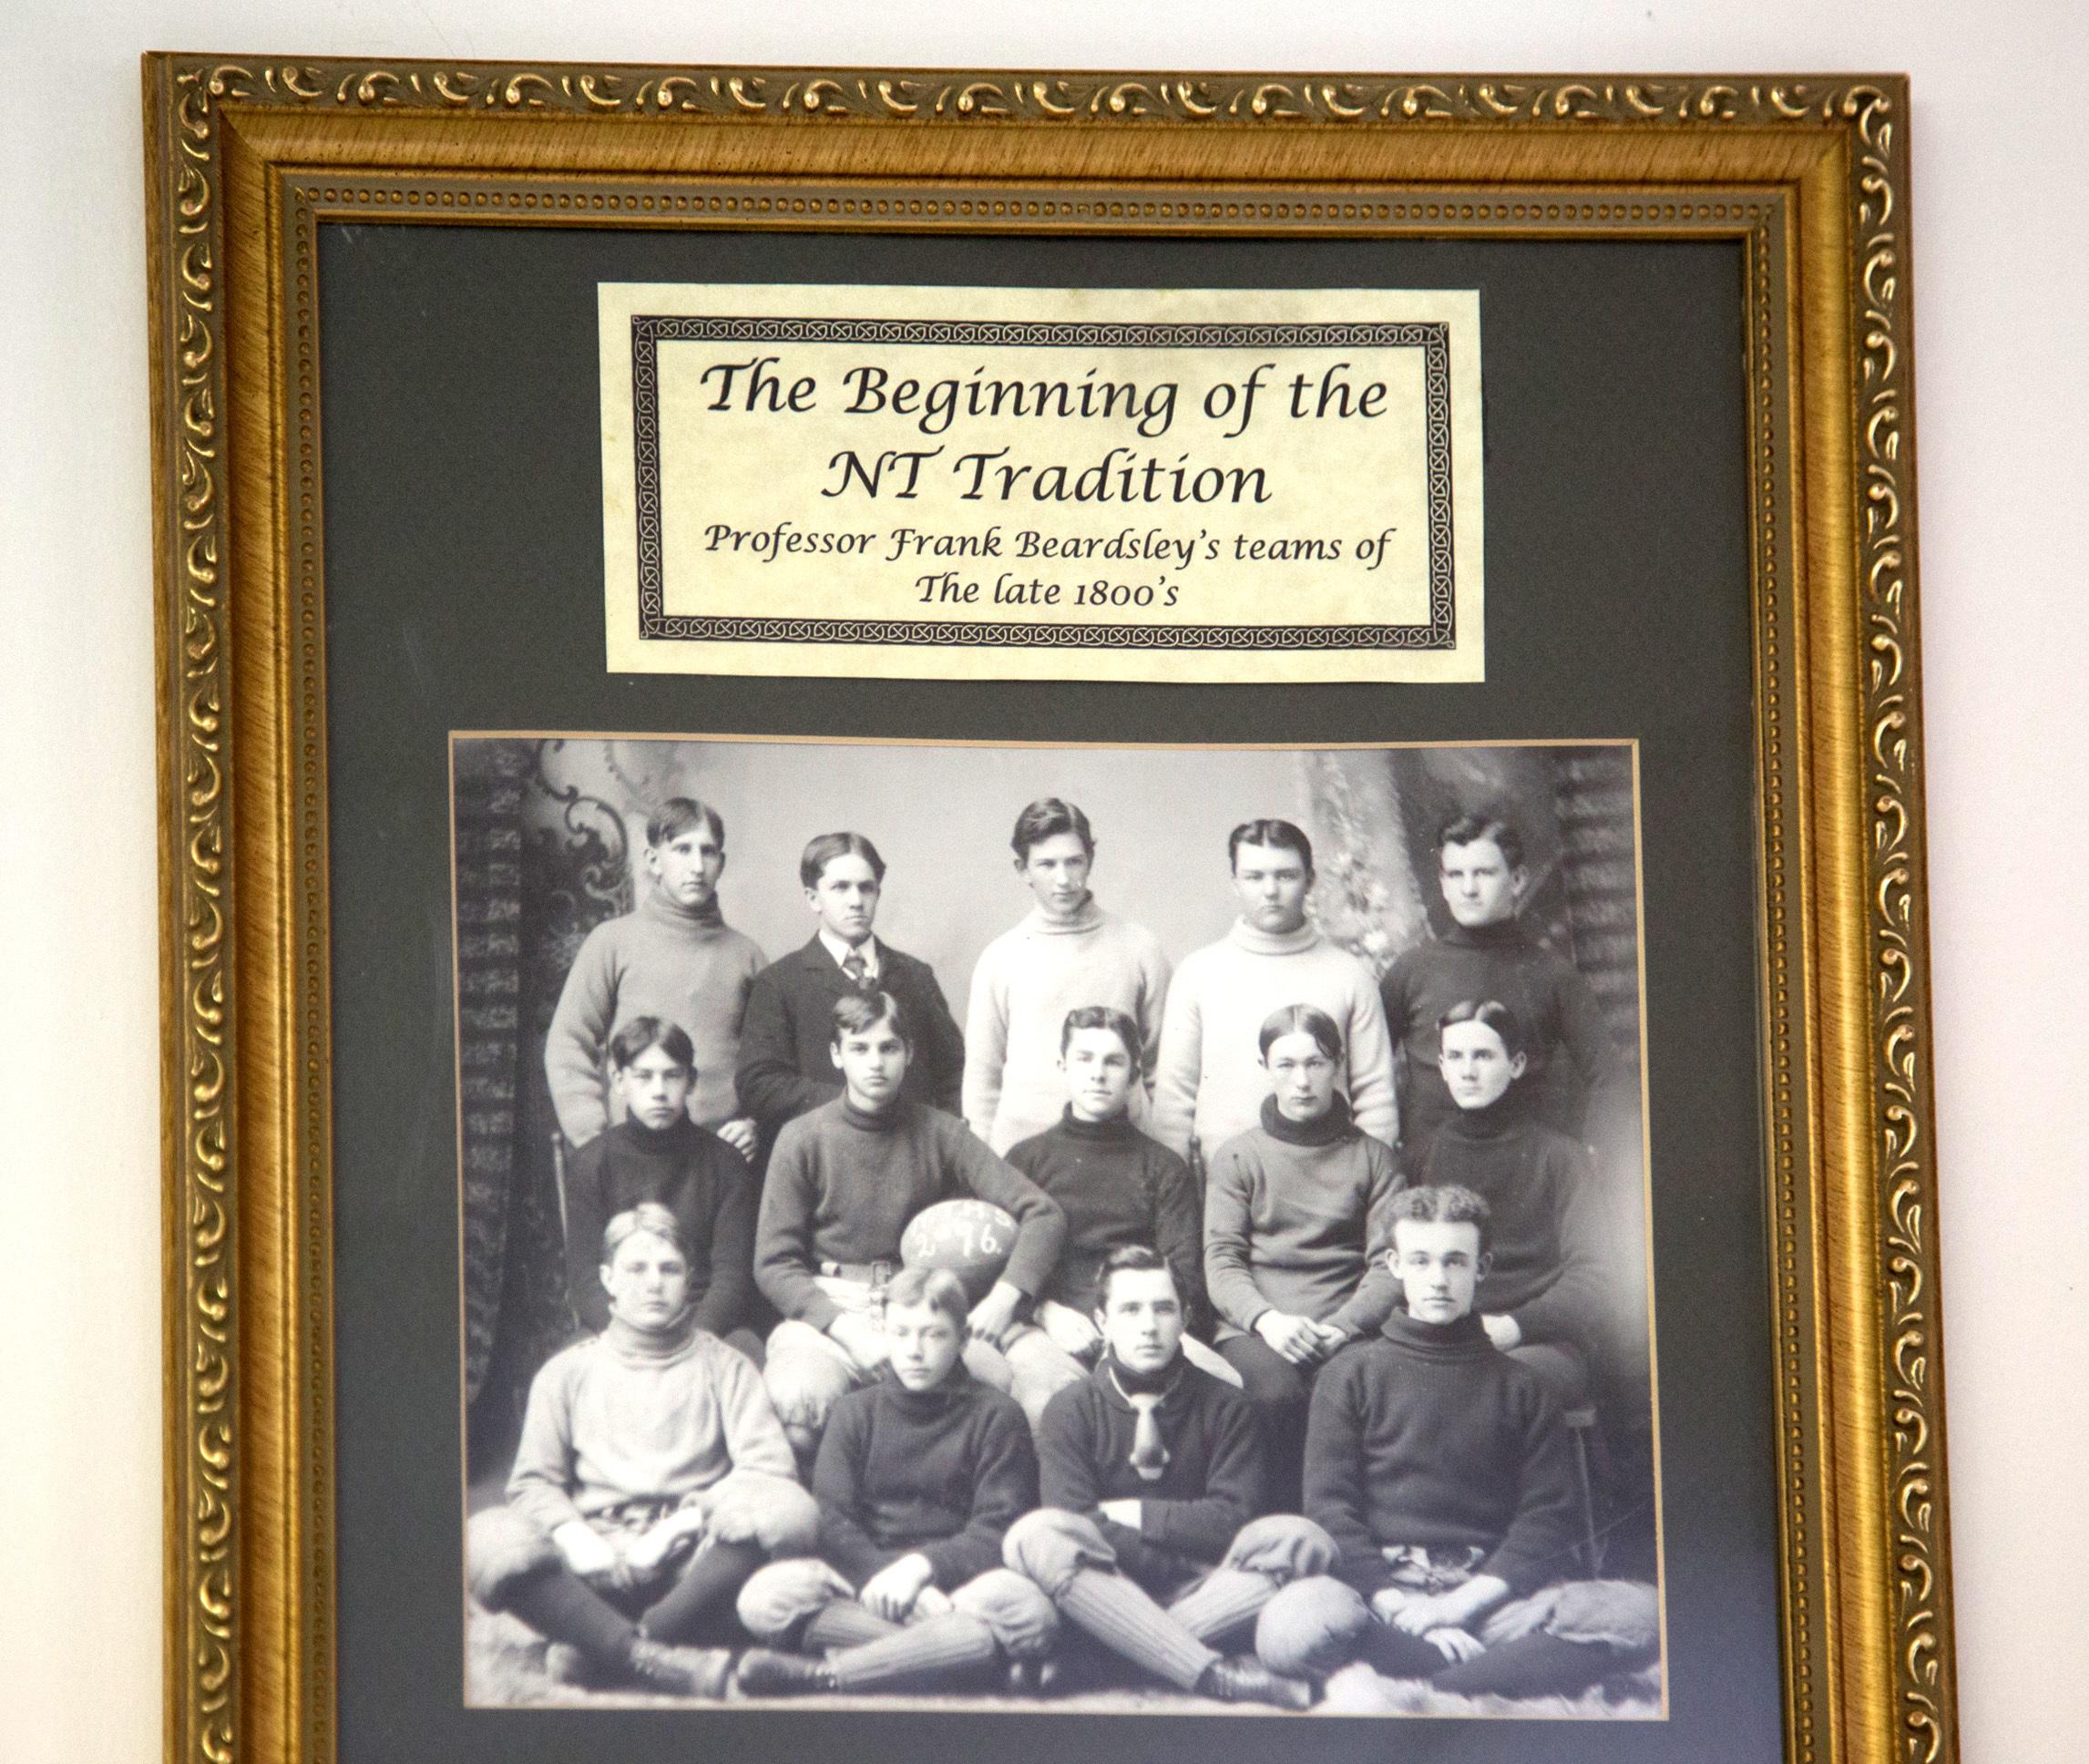 The Beginning of the NT Tradition, display at North Tonawanda Football Hall of Fame (2017).jpg